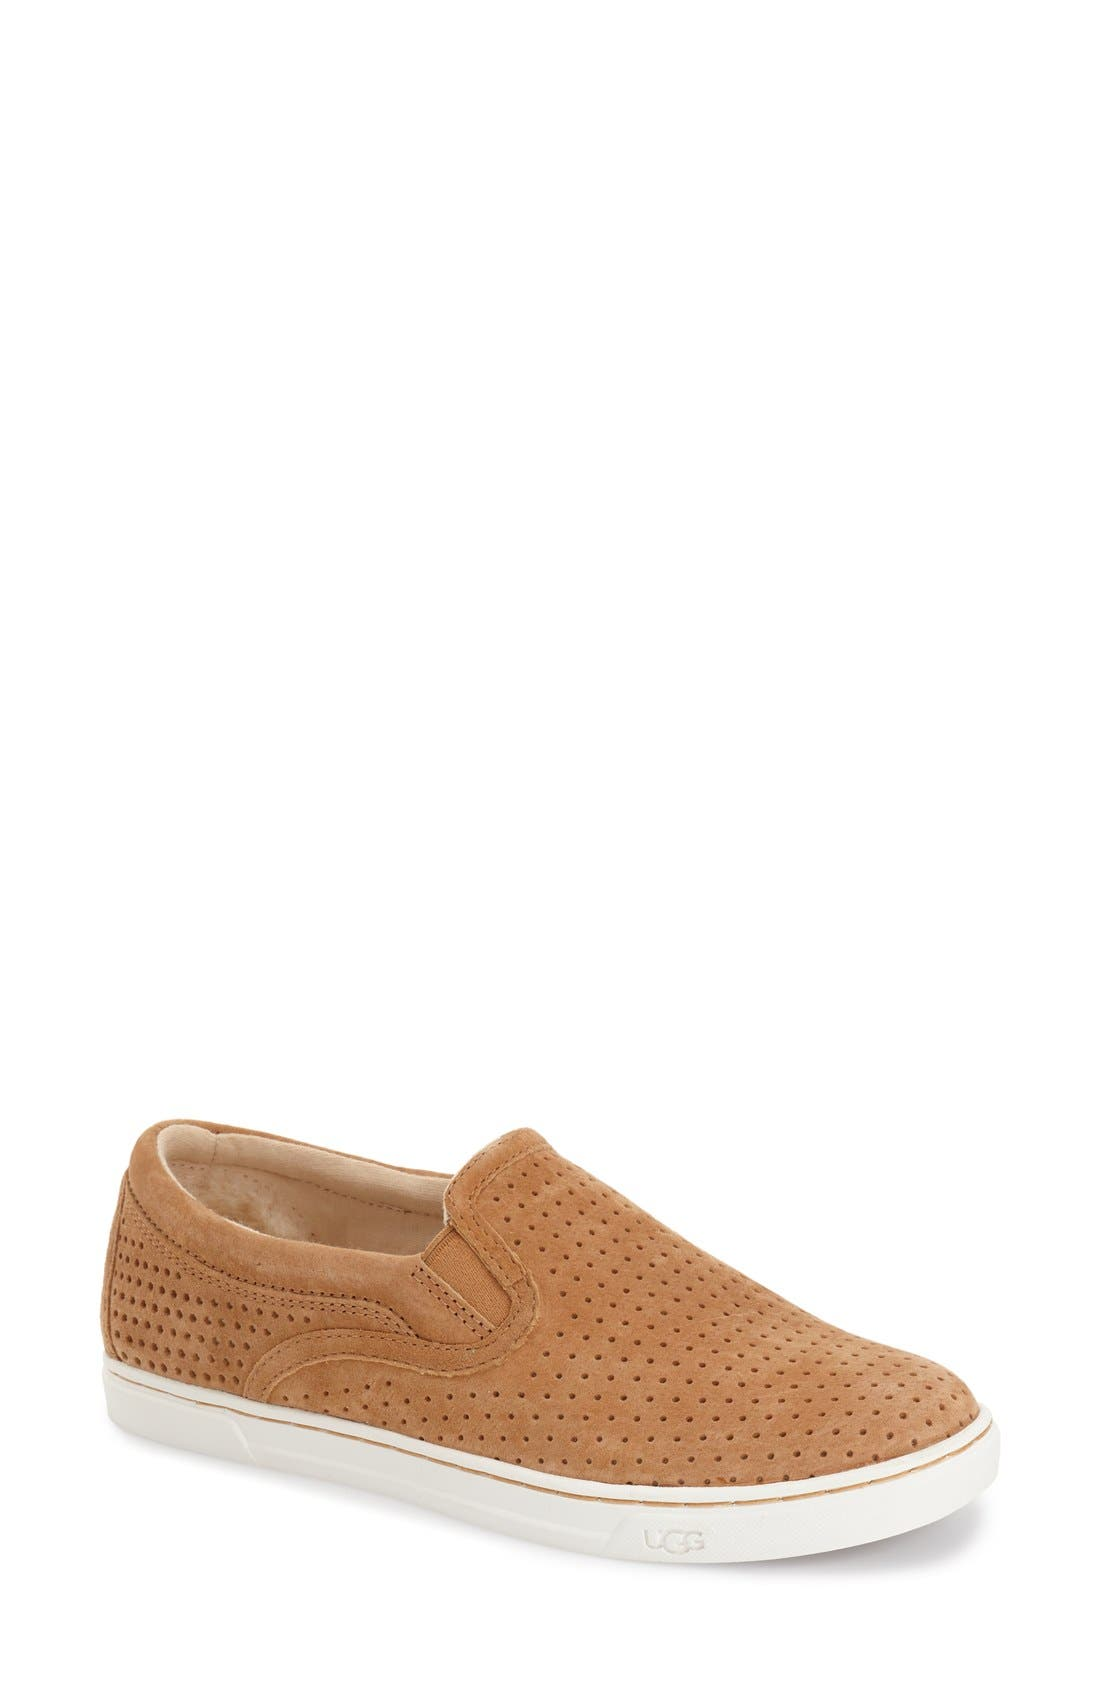 Main Image - UGG® 'Fierce Geo' Perforated Slip-On Sneaker (Women)